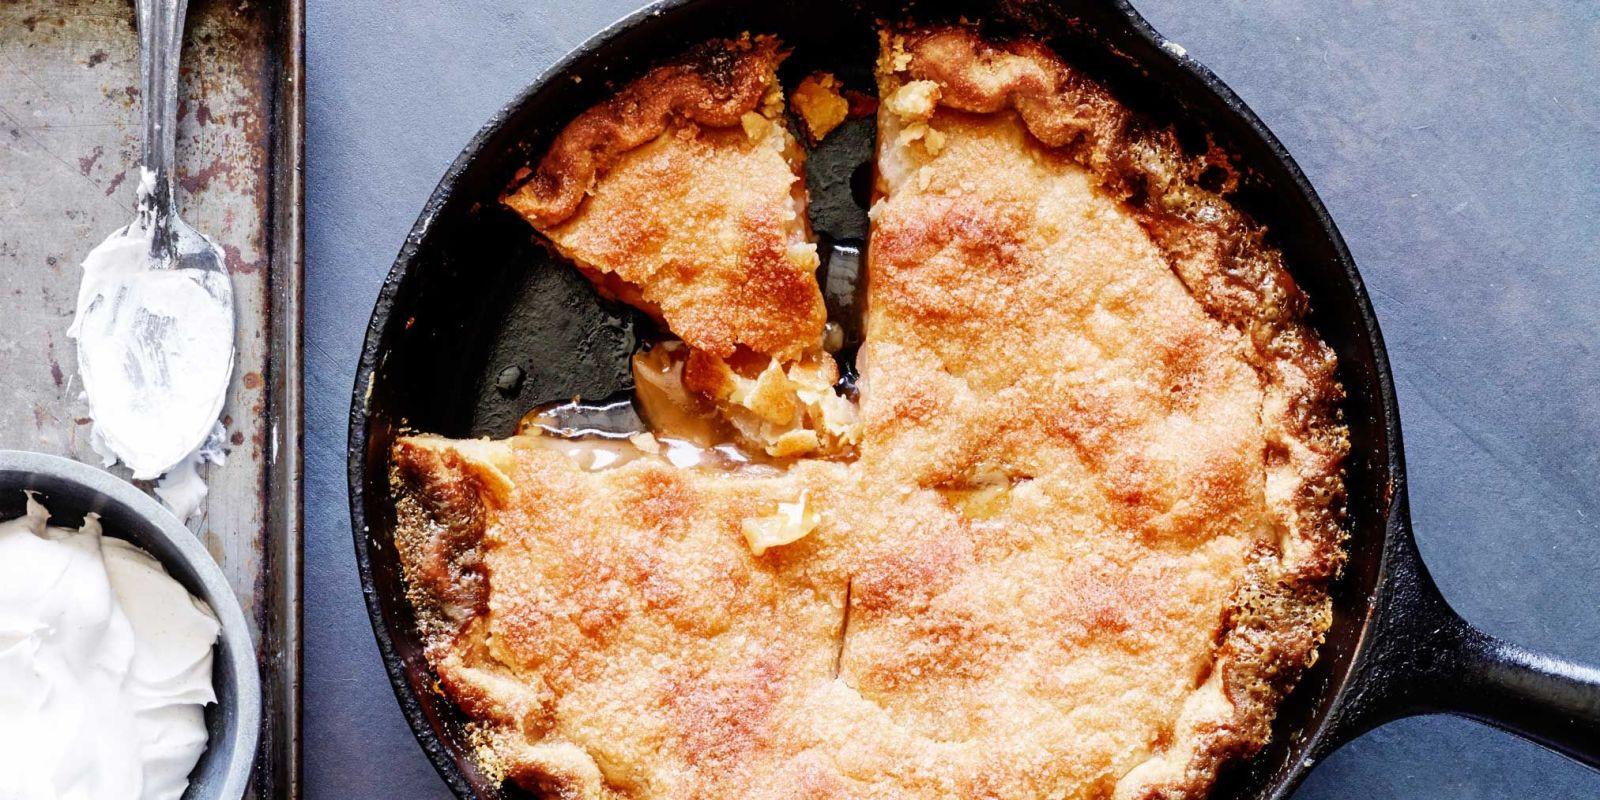 Trisha Yearwood Skillet Apple Pie  Mrs Carter s Skillet Apple Pie Recipe Trisha Yearwood